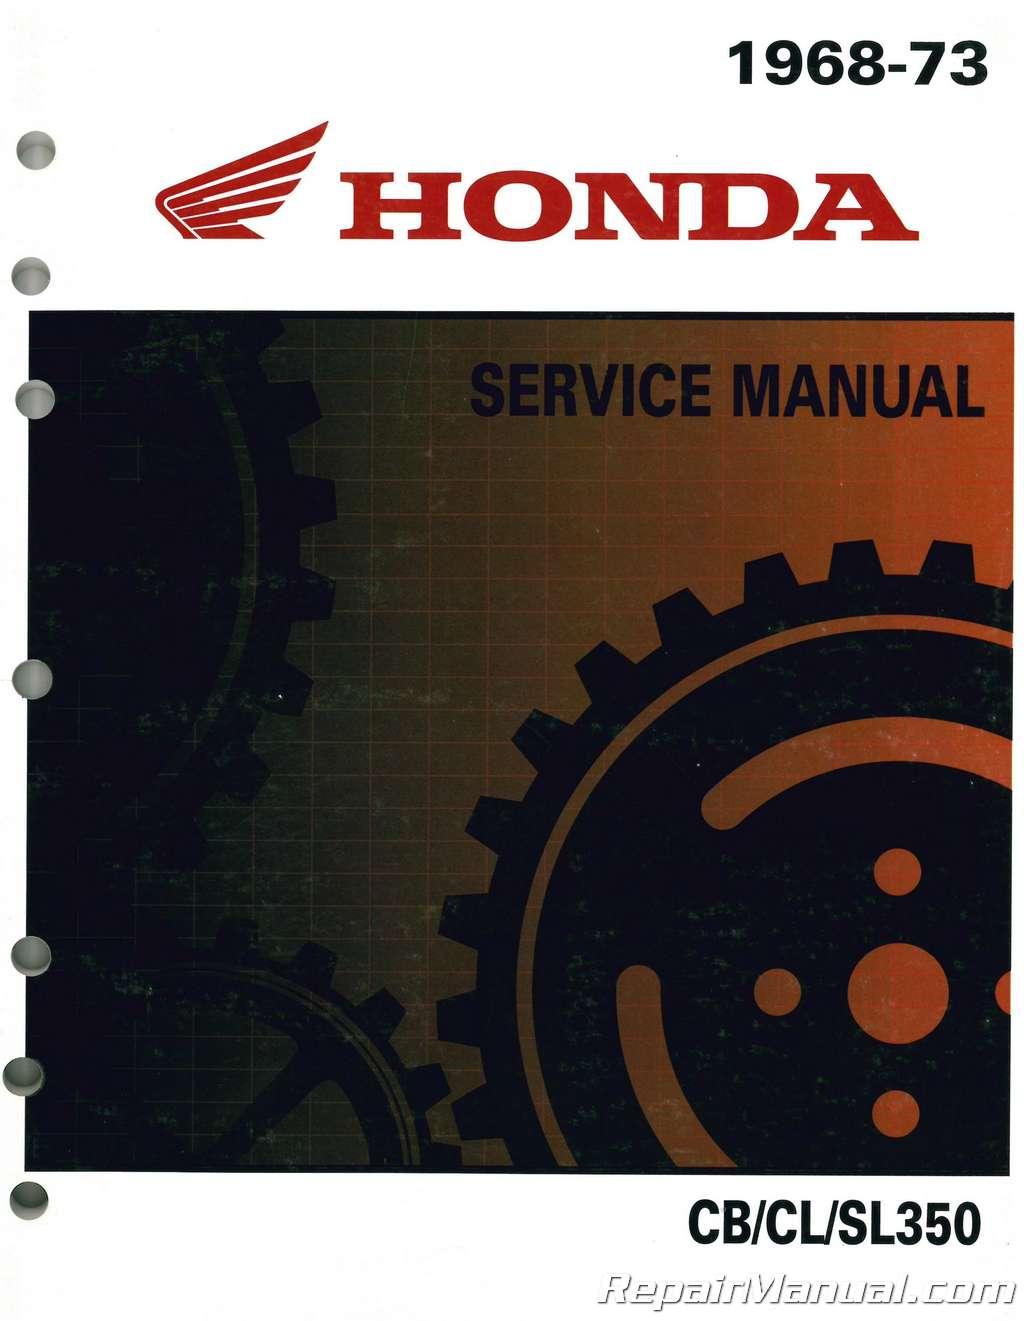 HONDA Workshop Manual CL250 CL350 SL350 1968 1969 1970 1971 1972 1973 and 1974